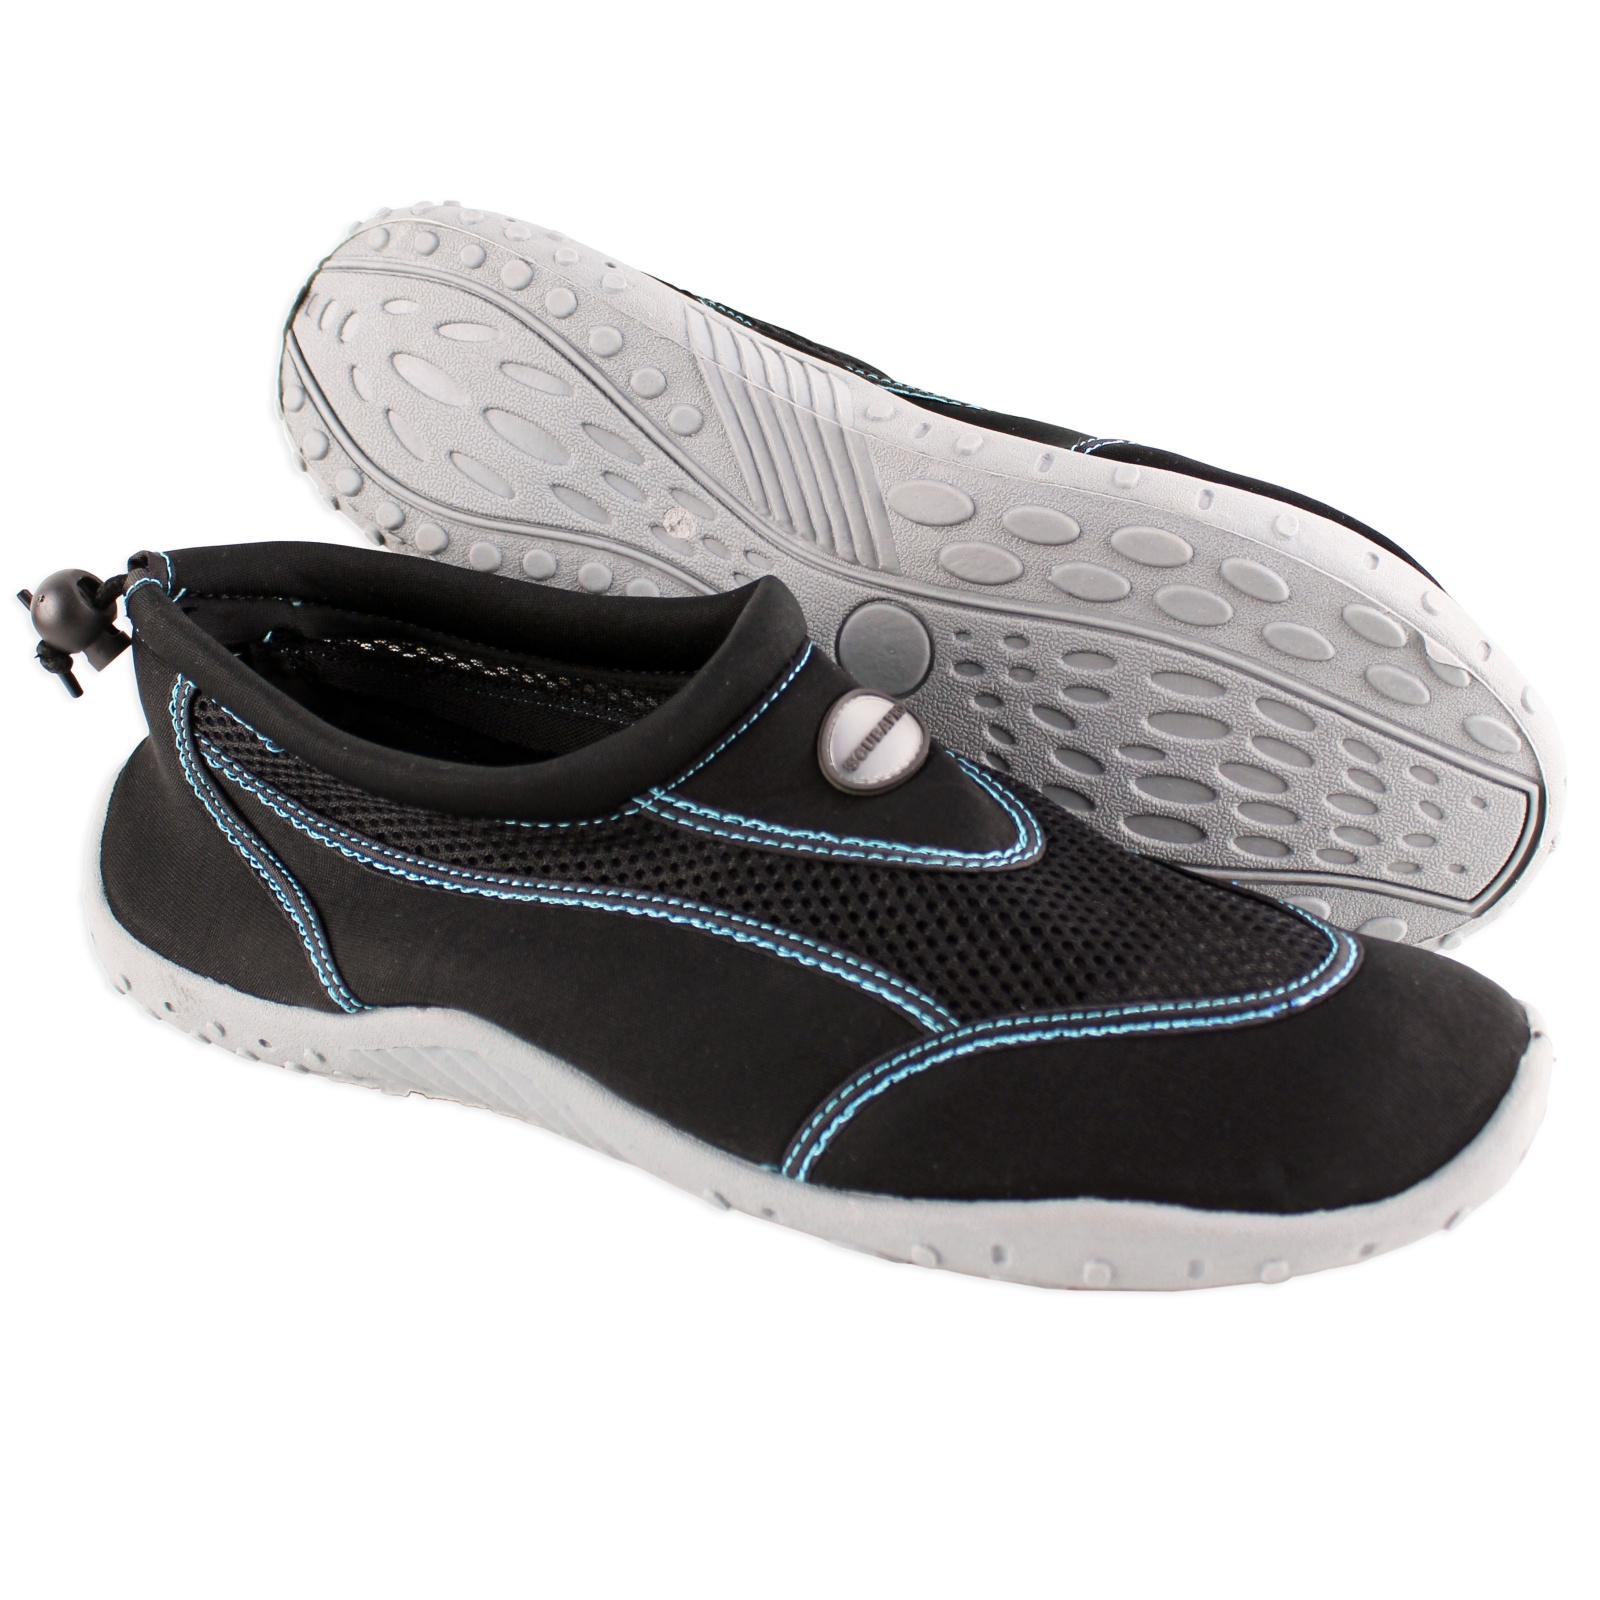 Neoprenové boty SCUBAPRO Kailua - vel. 41